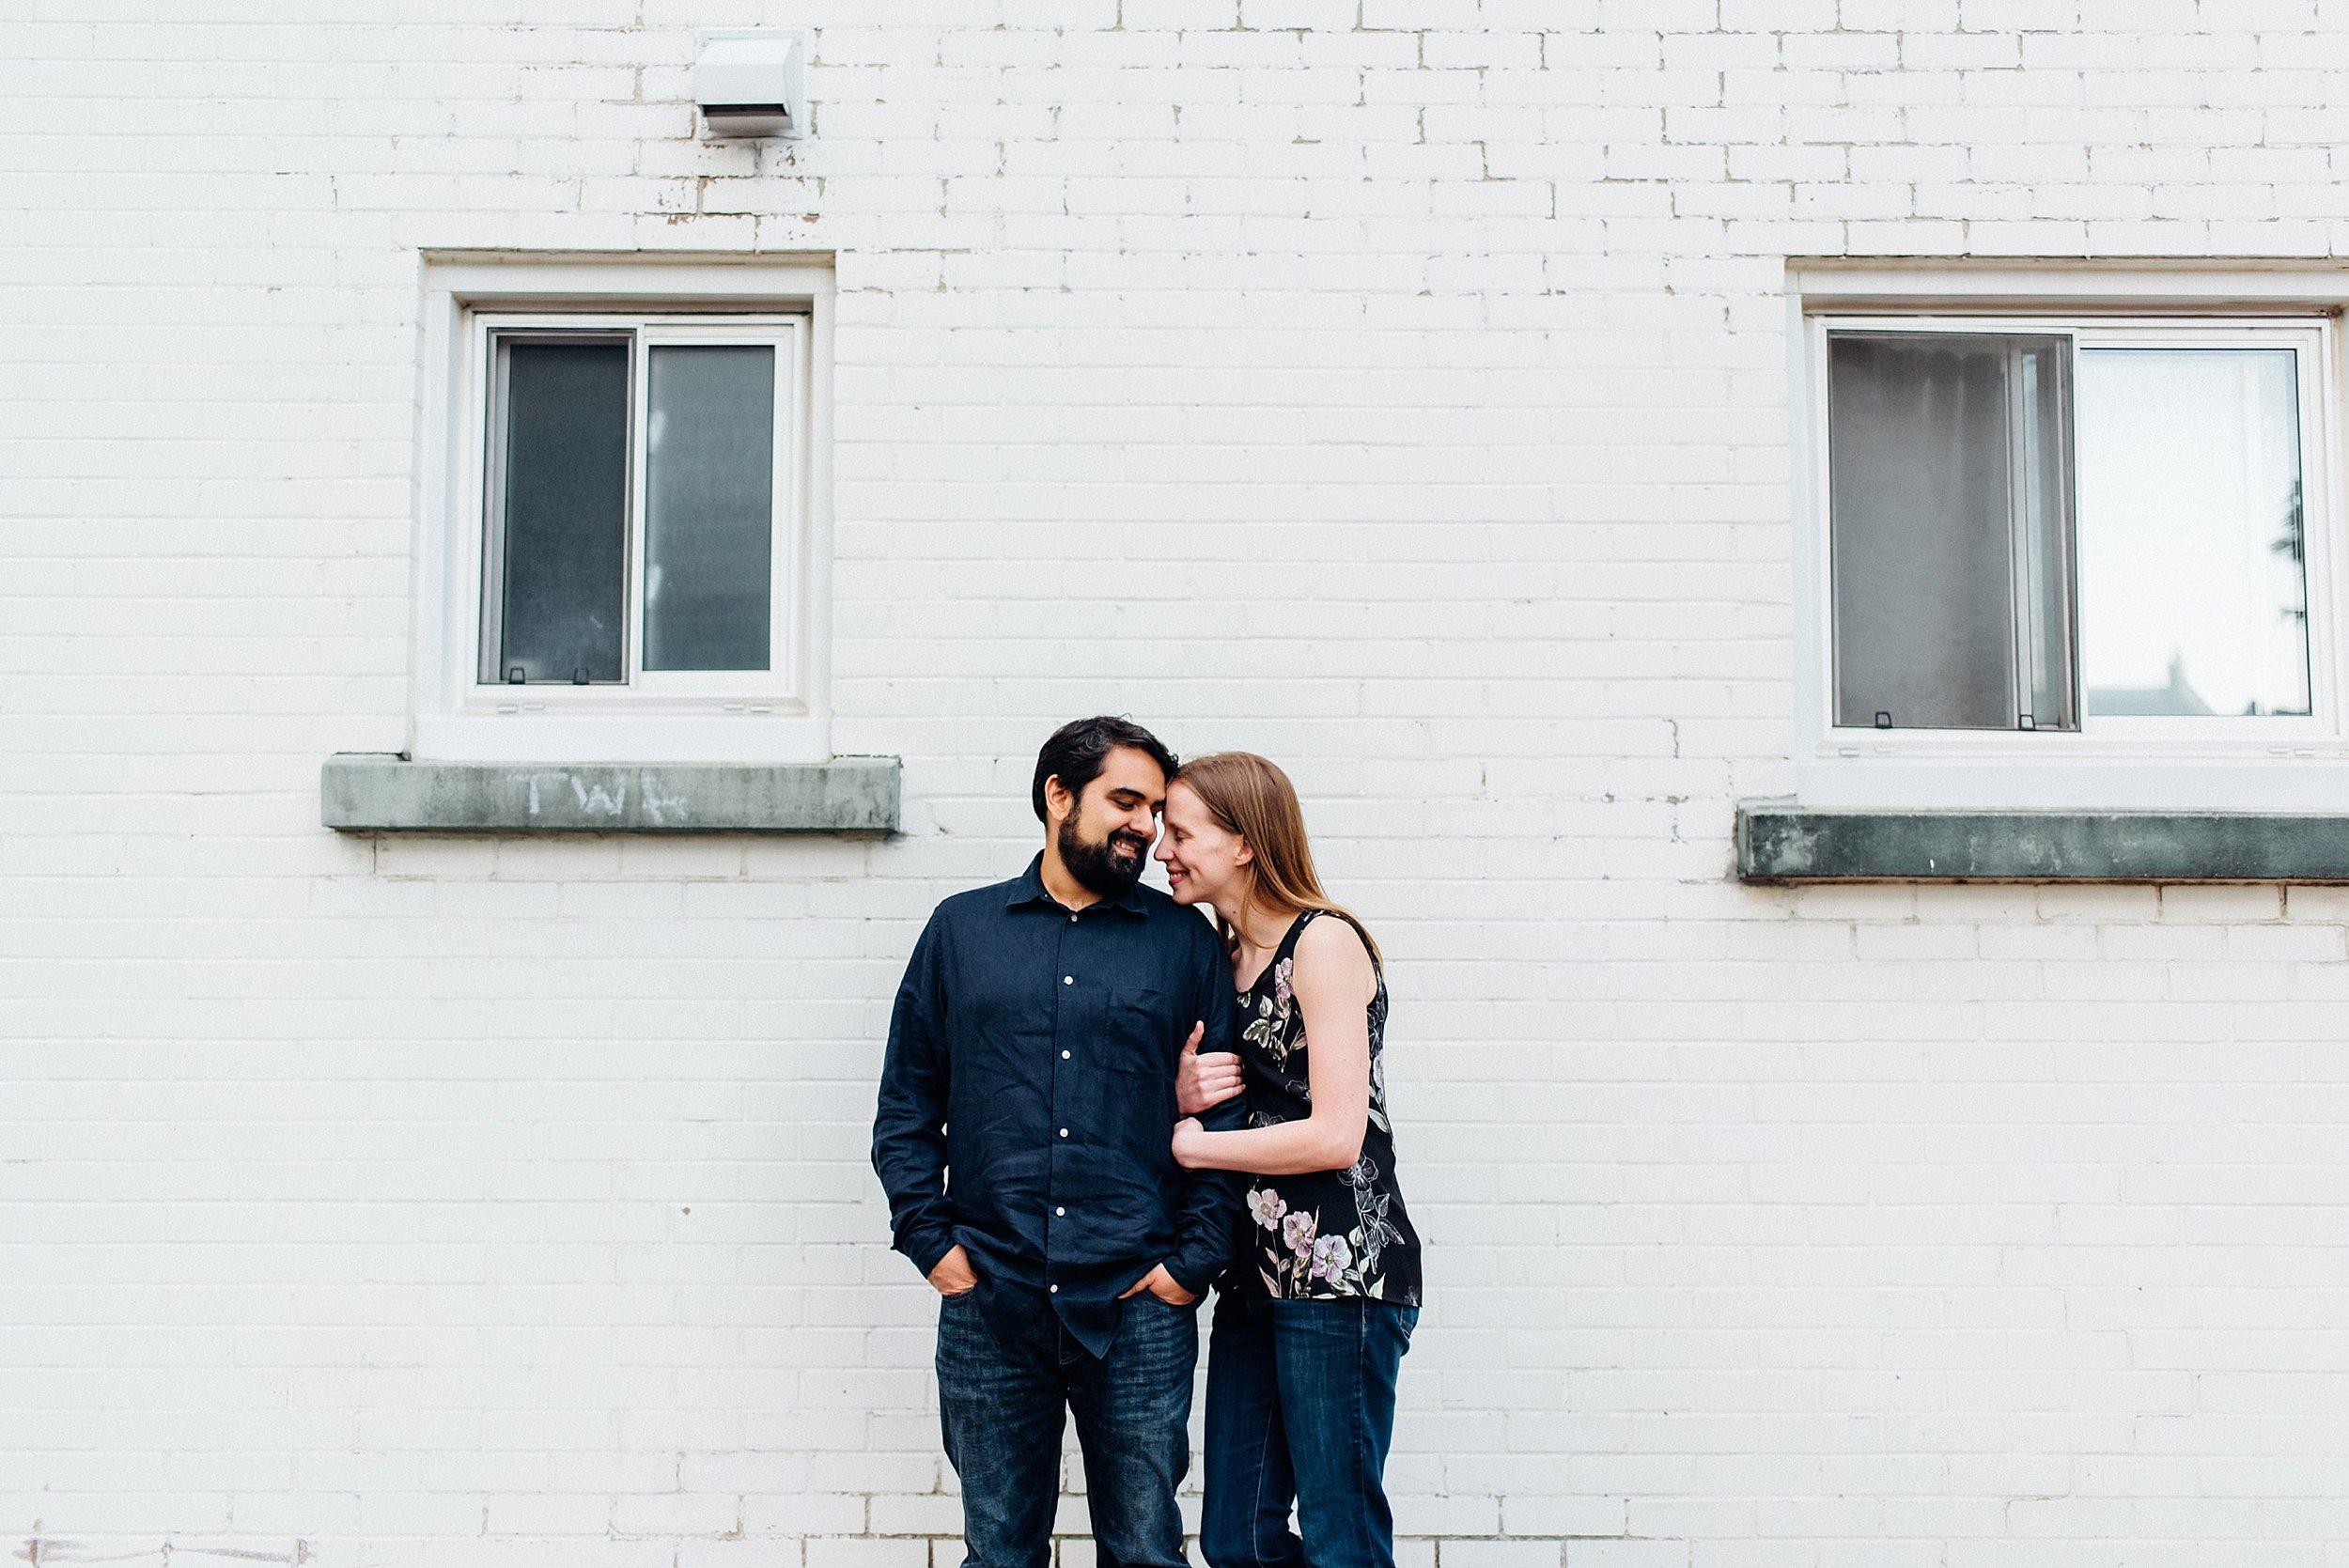 light, airy, fine art, documentary ottawa wedding photographer - best engagement photos 2017_0035.jpg